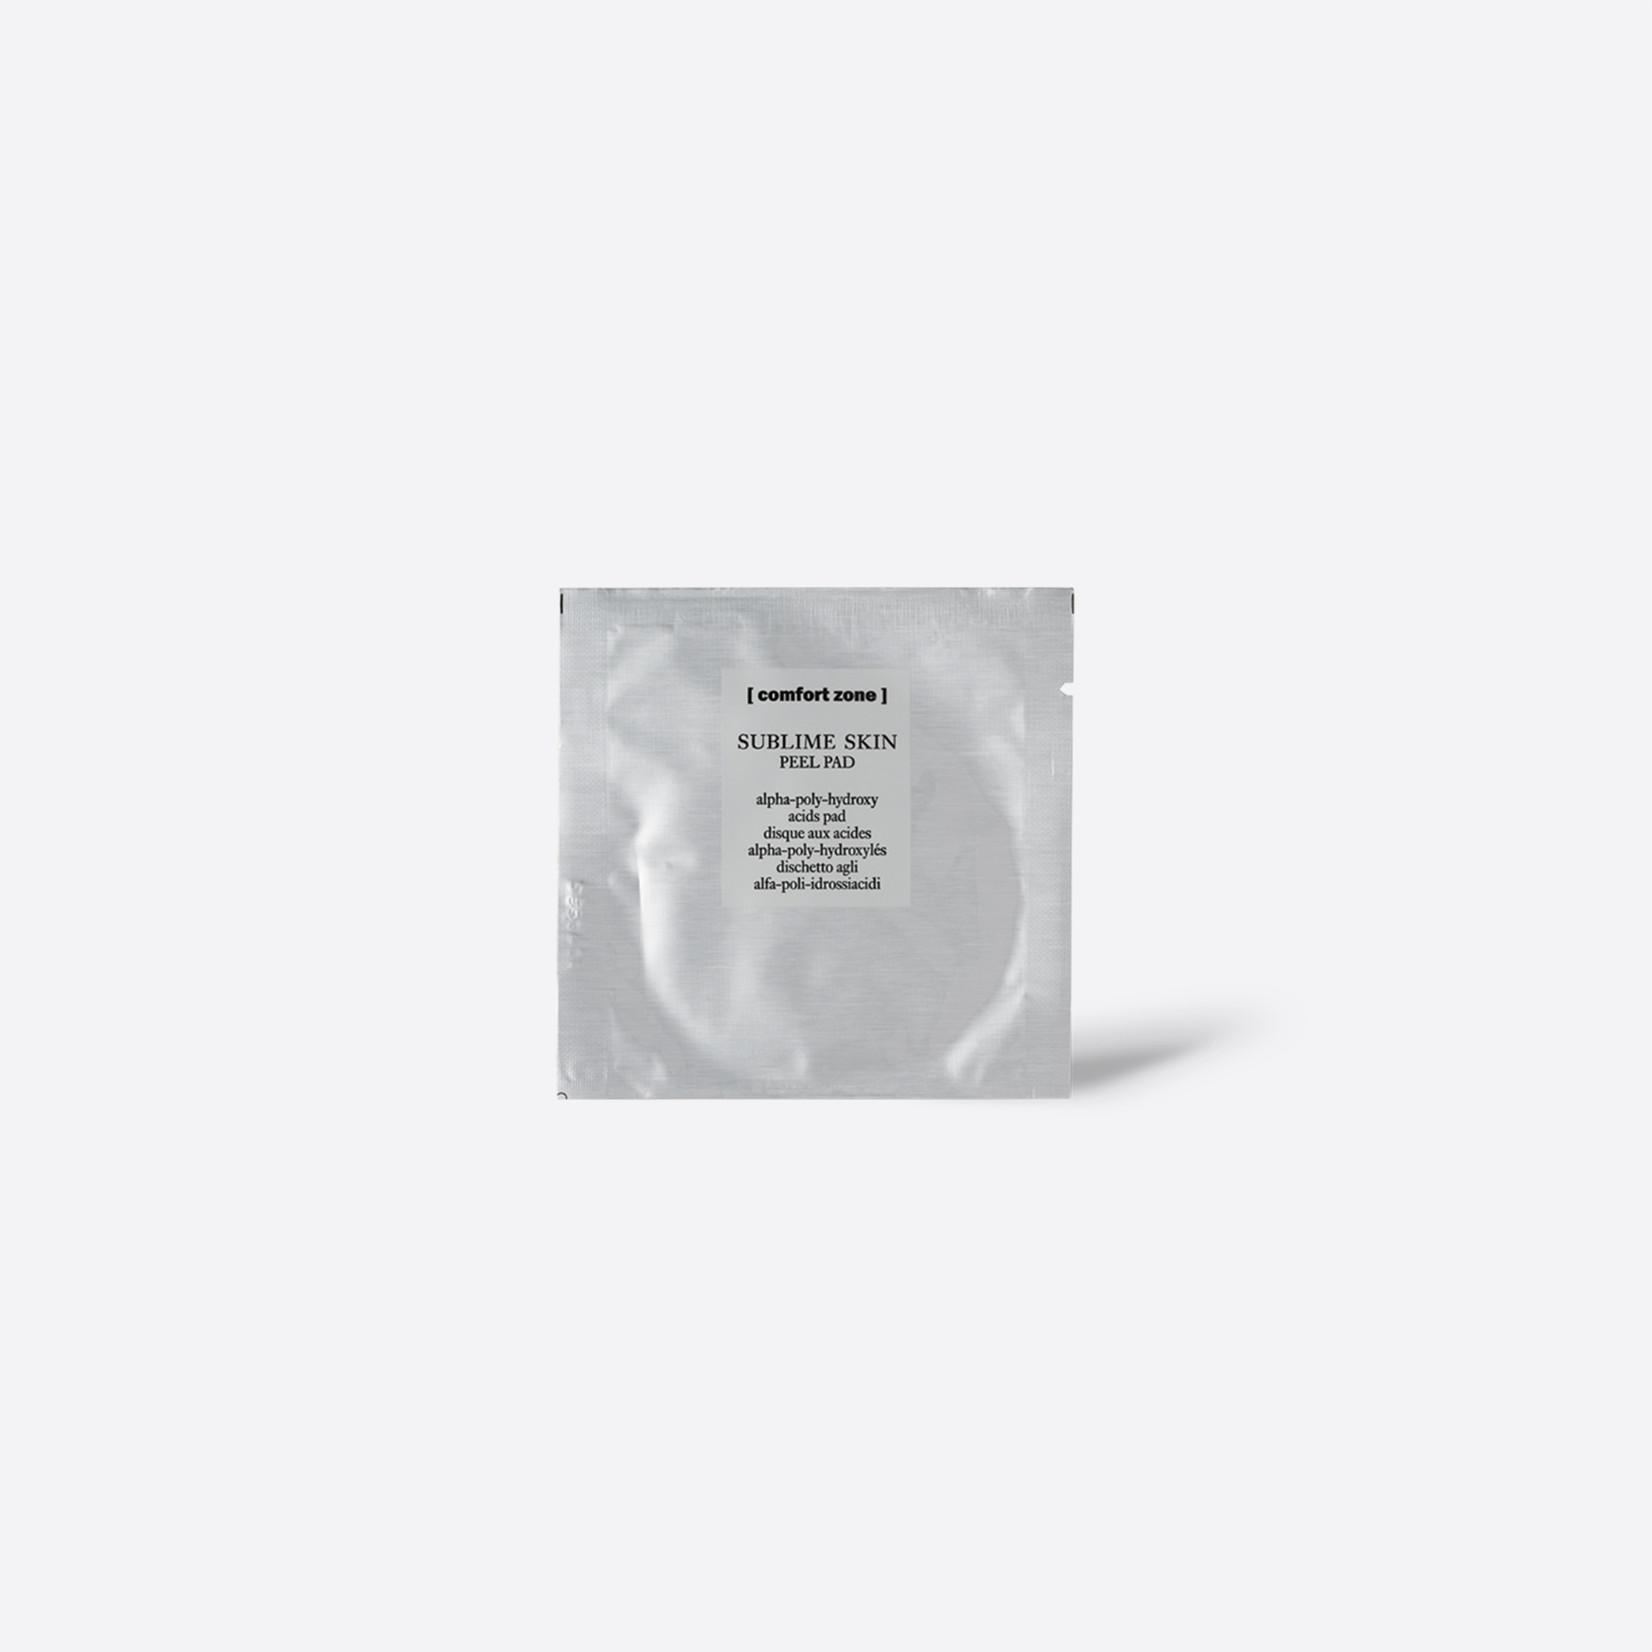 Comfort Zone Sublime Skin Peel Pad